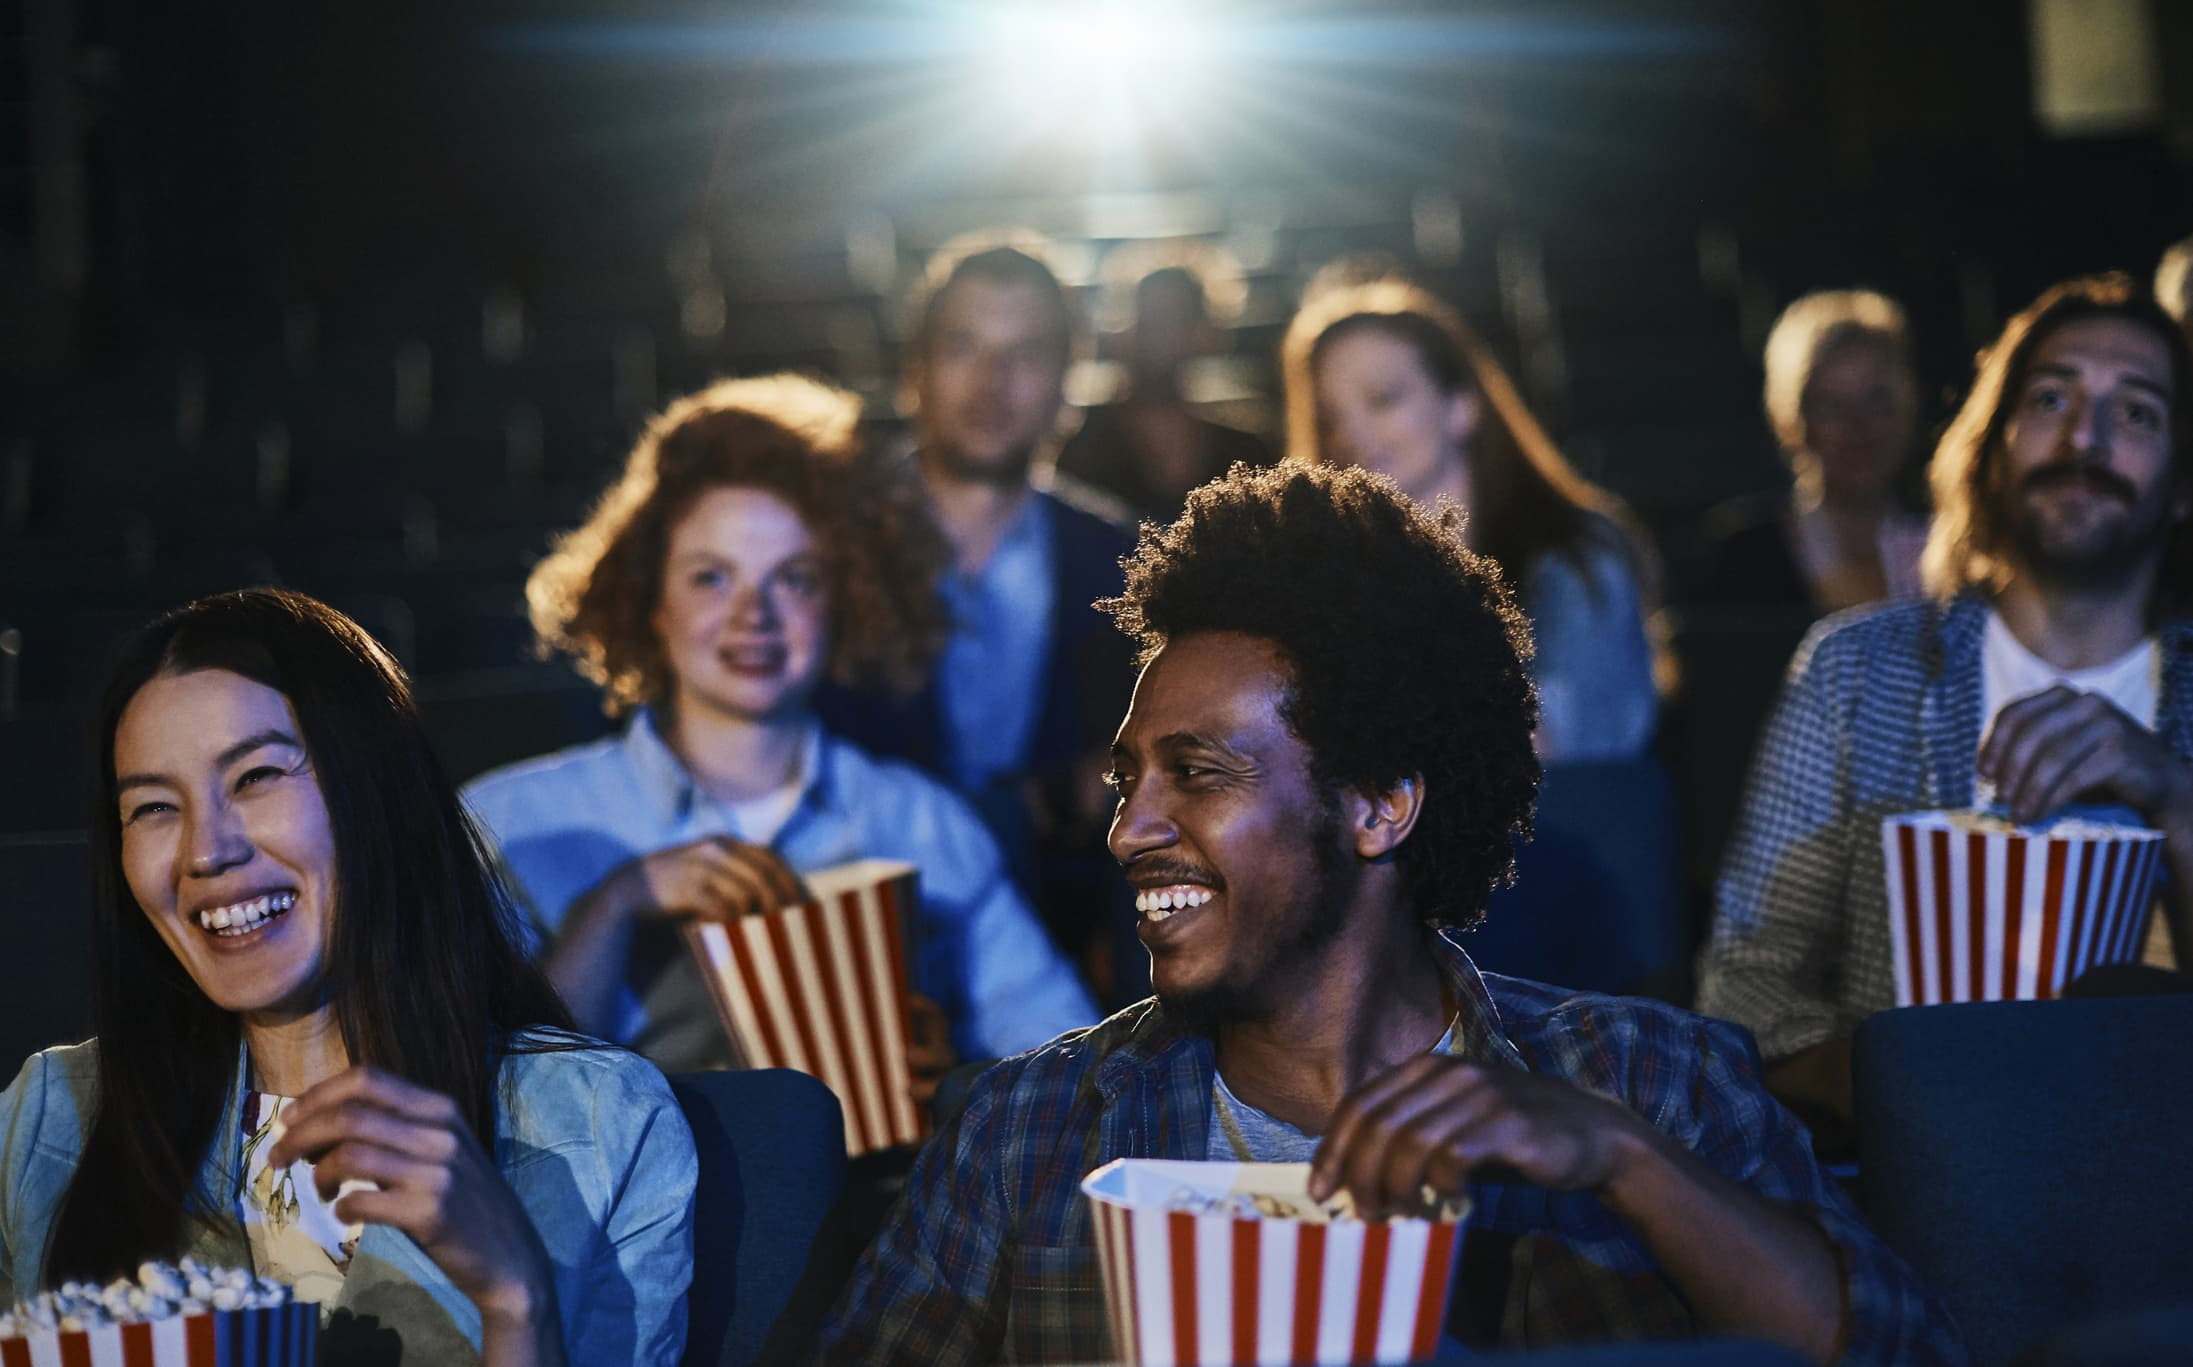 A brand new deal Hollywood studios, film theaters, Netflix want: Jason Blum